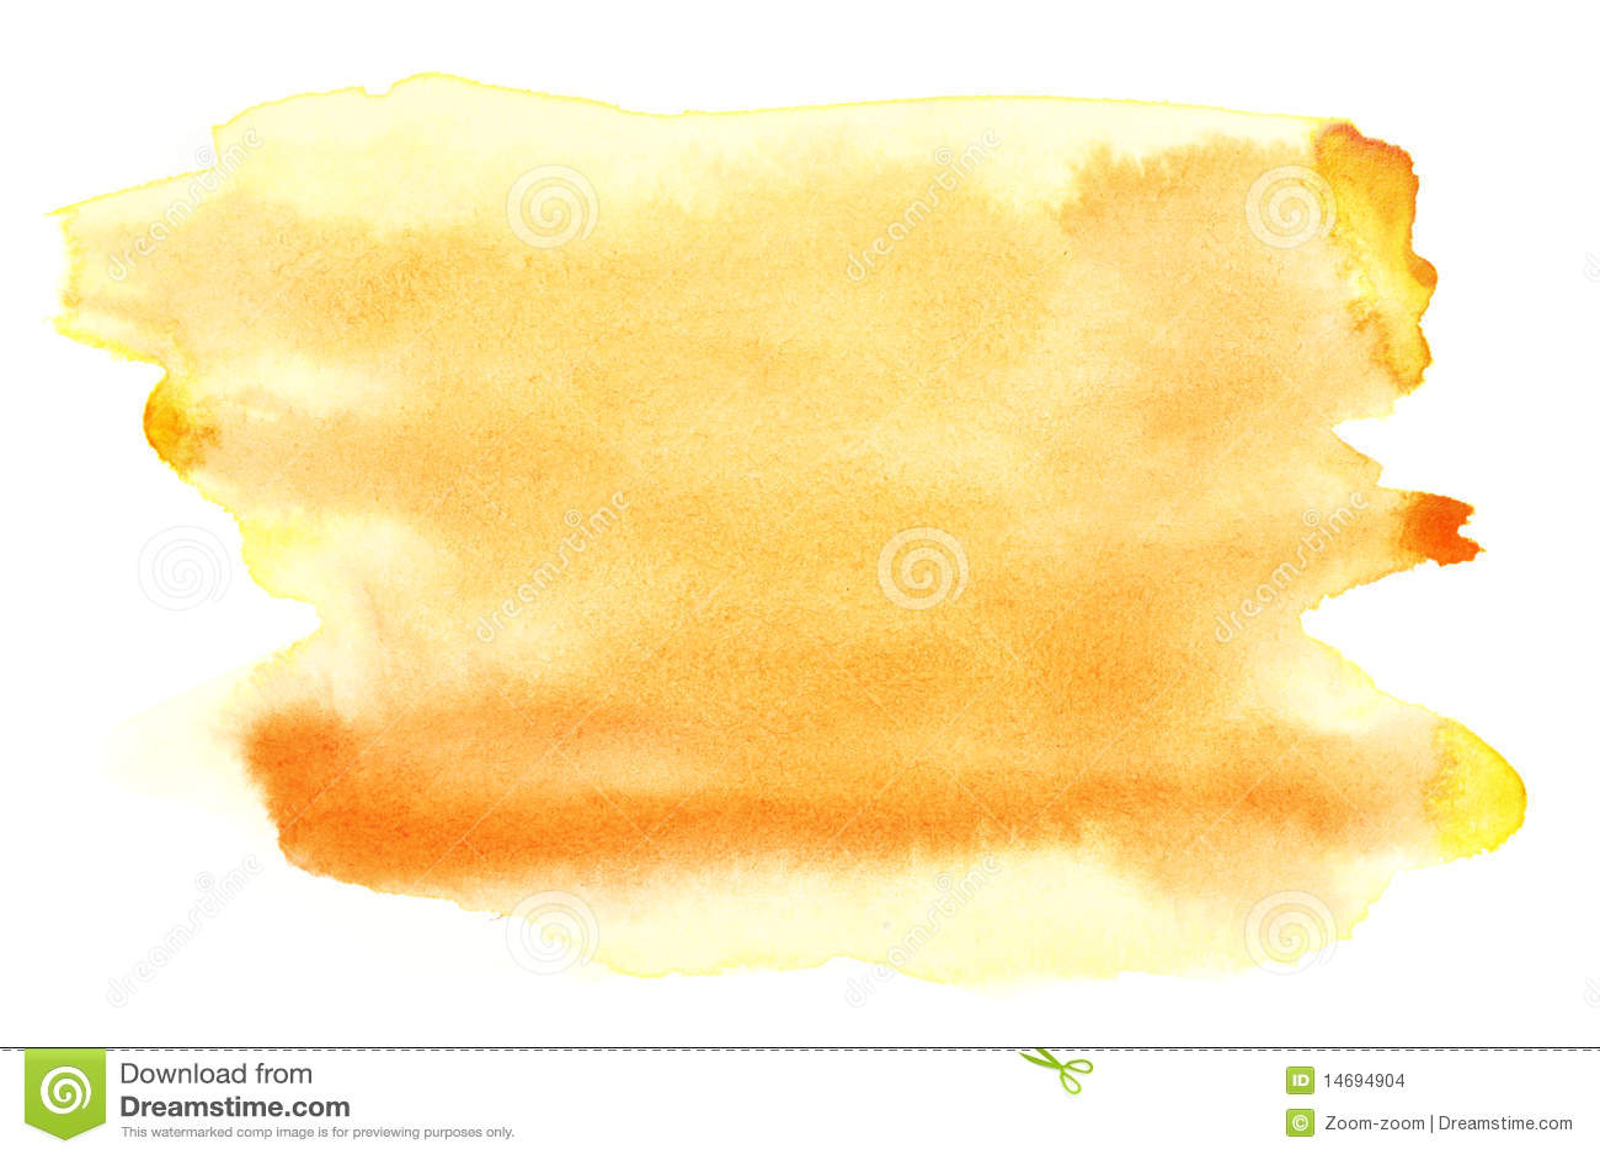 Yellow watercolor